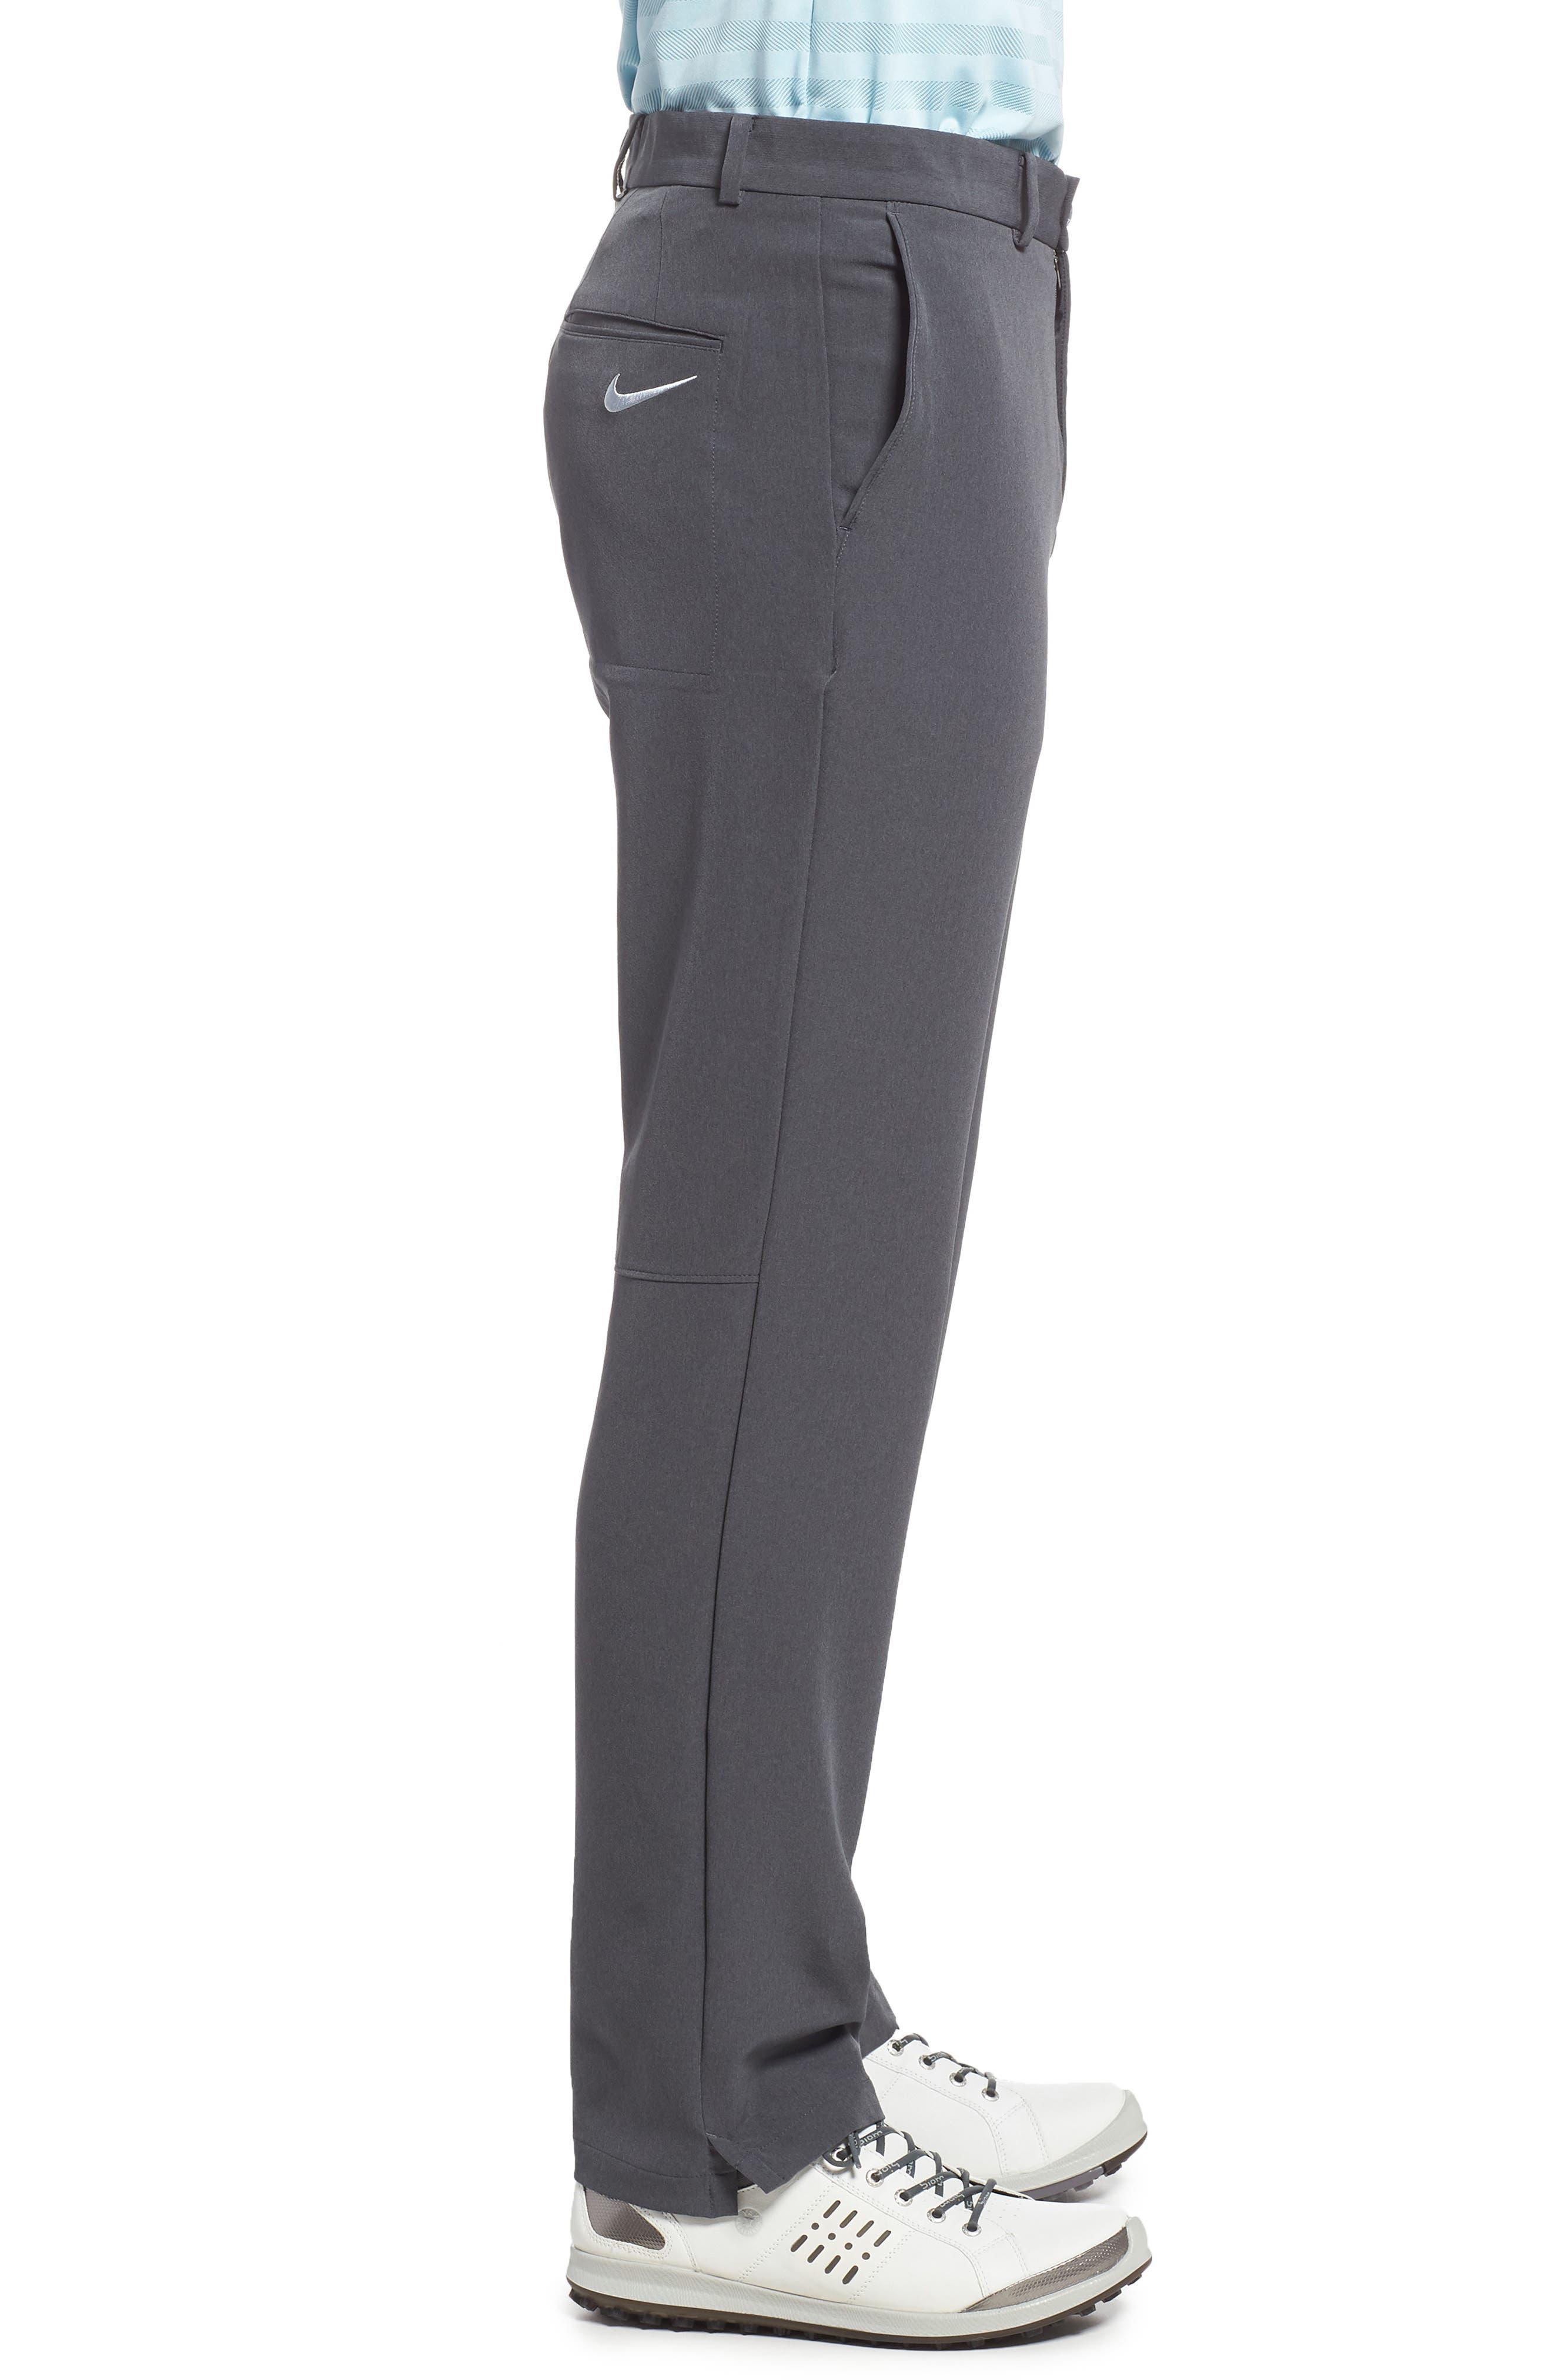 Hybrid Flex Golf Pants,                             Alternate thumbnail 3, color,                             CHARCOAL HEATHER/ DARK GREY